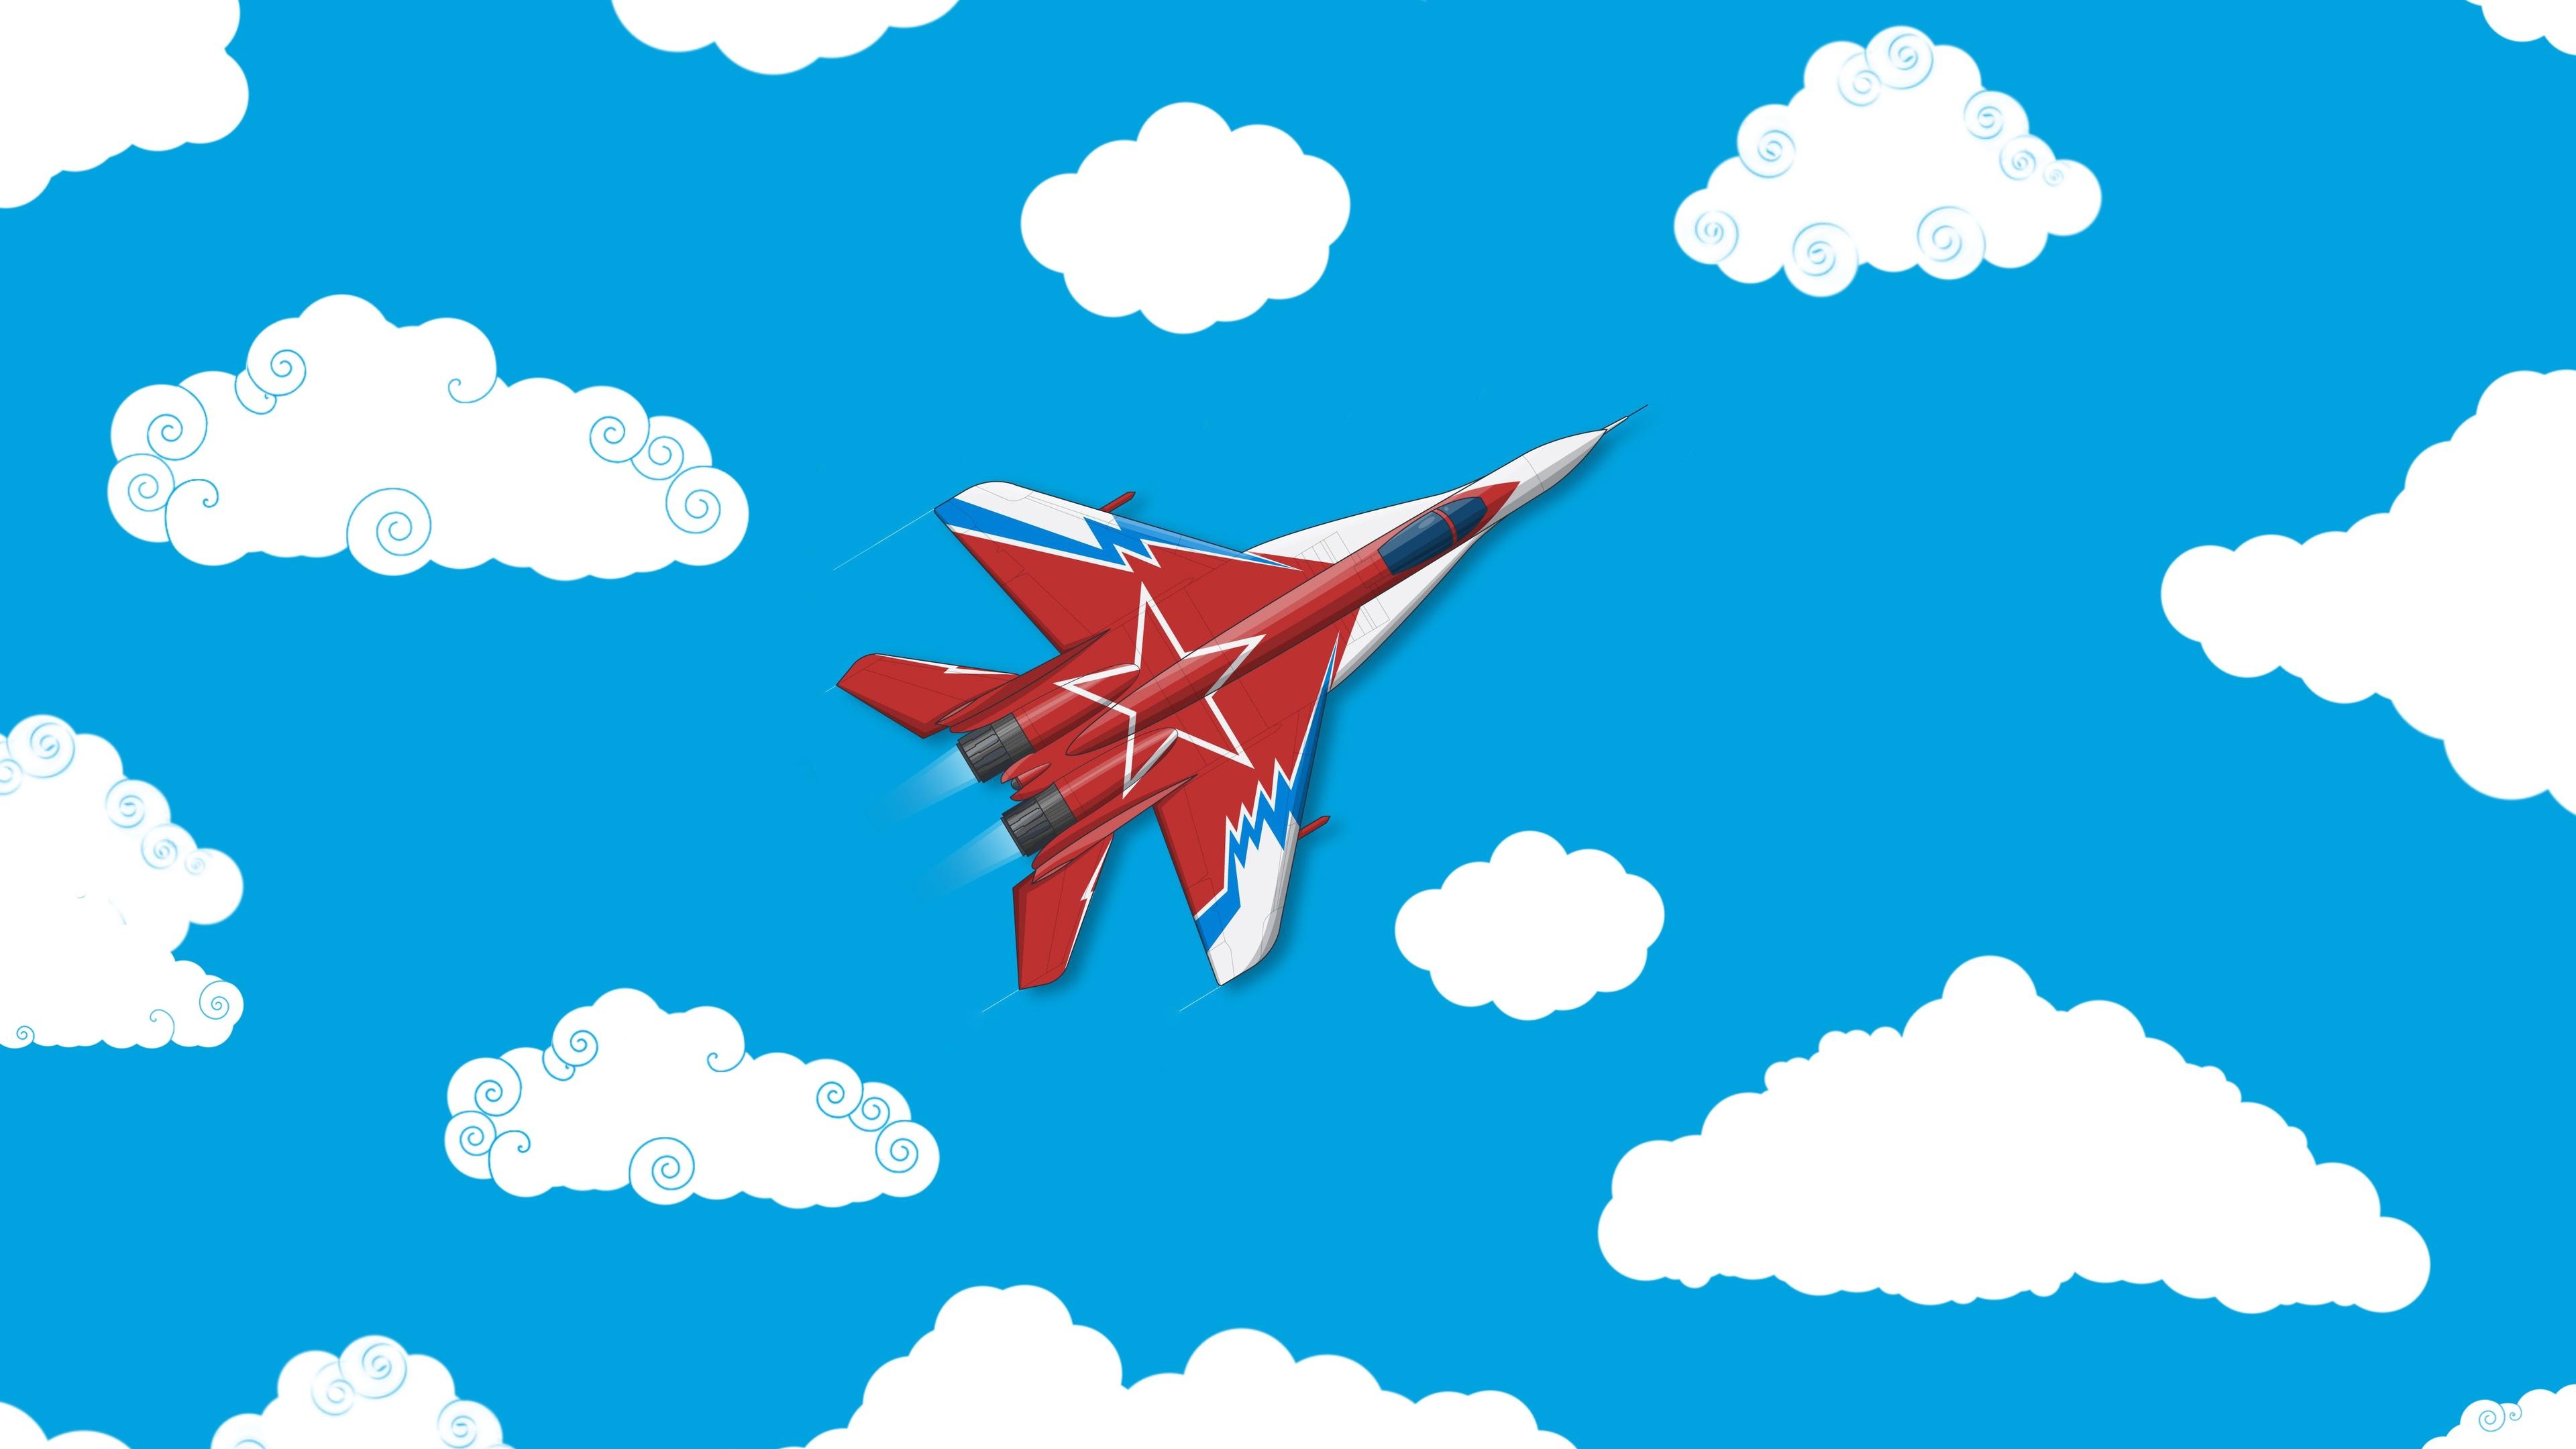 military aircraft minimalism 4k 1540755042 - Military Aircraft Minimalism 4k - planes wallpapers, minimalism wallpapers, hd-wallpapers, digital art wallpapers, artwork wallpapers, artist wallpapers, aircraft wallpapers, 4k-wallpapers